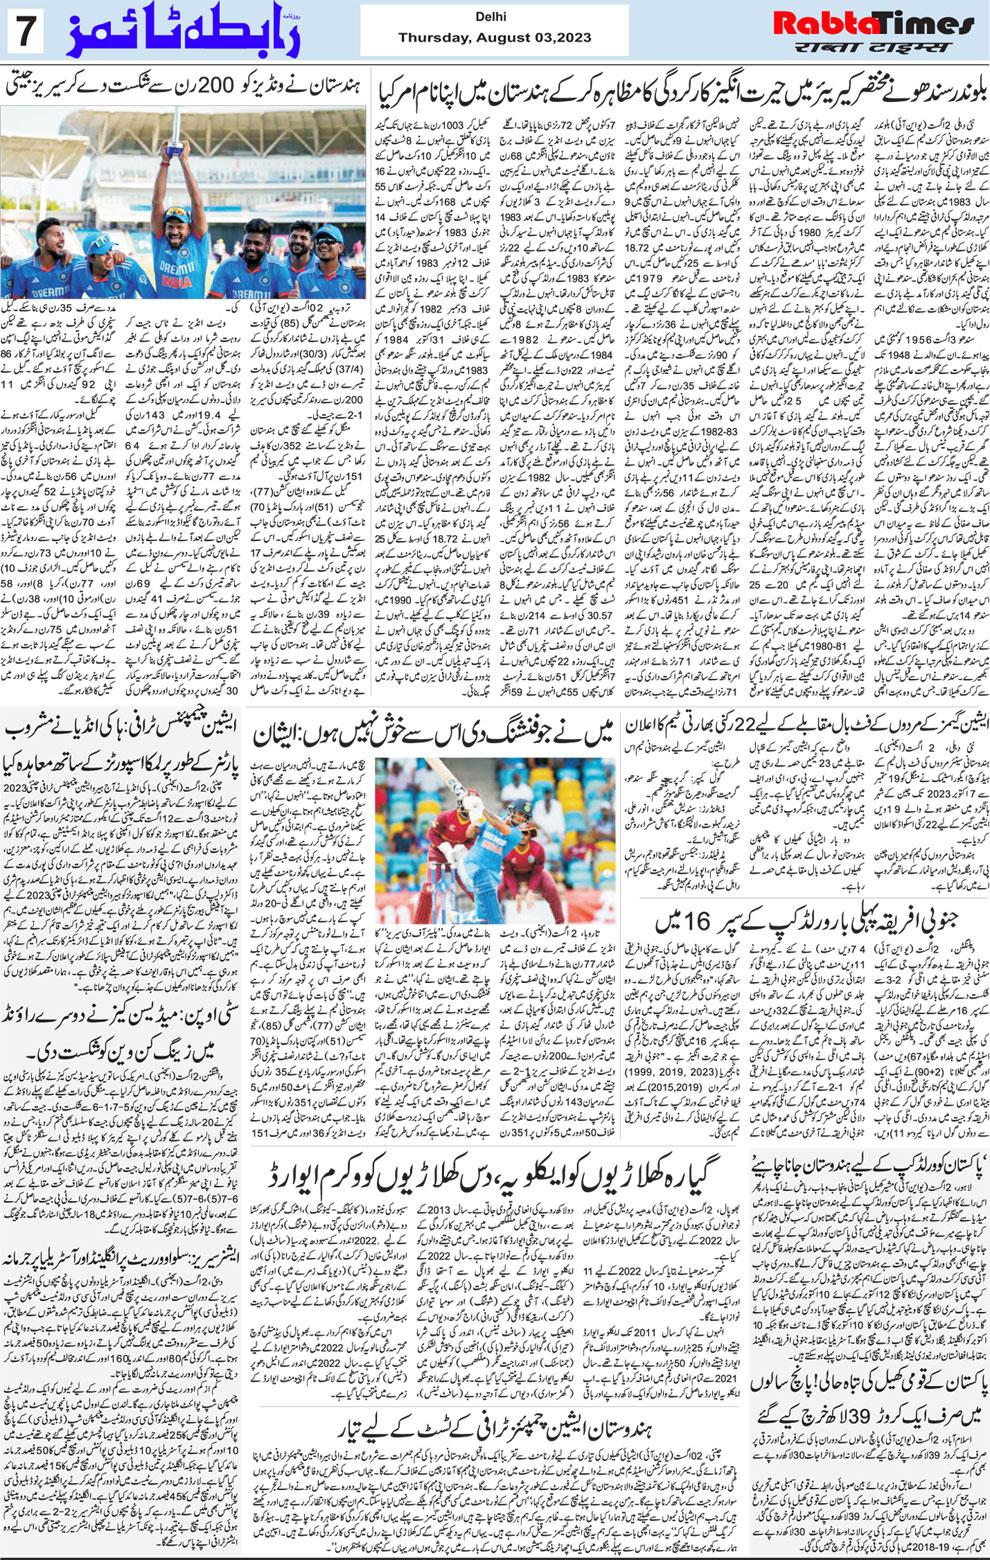 Rabta Times